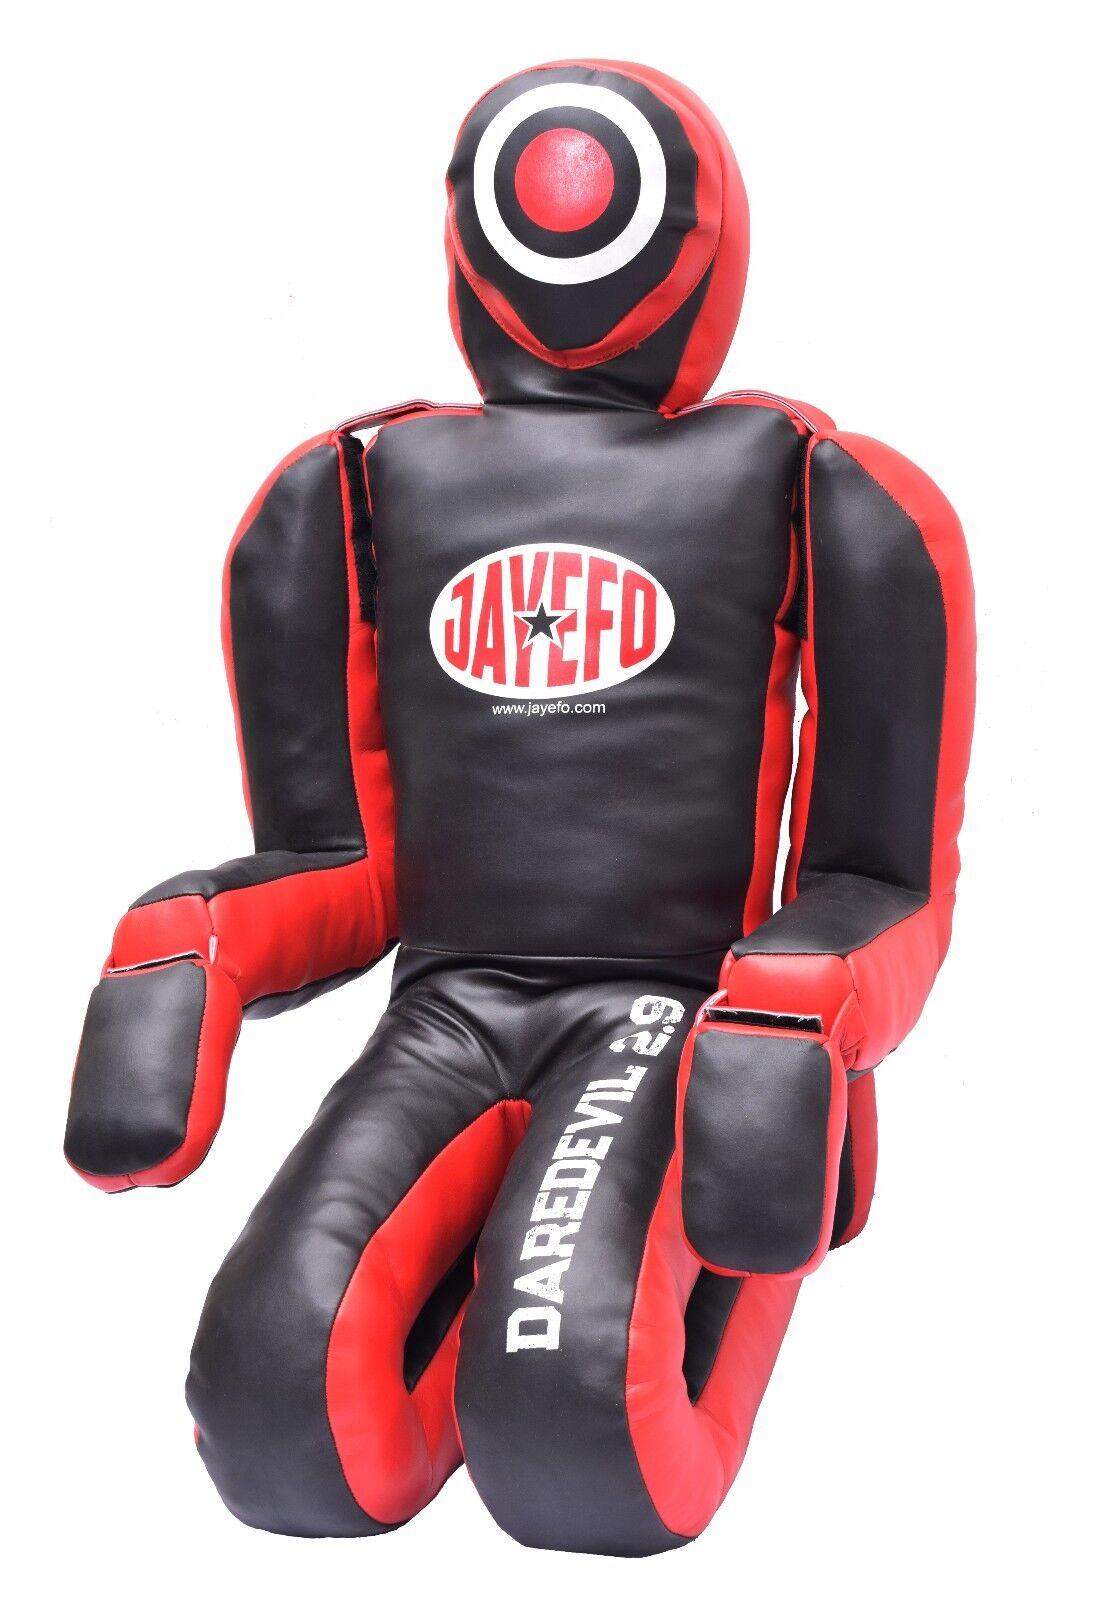 Jayefo Daredevil 2.9® Brazilian Jiu Jitsu Grappling Dummy MMA Judo Martial Arts